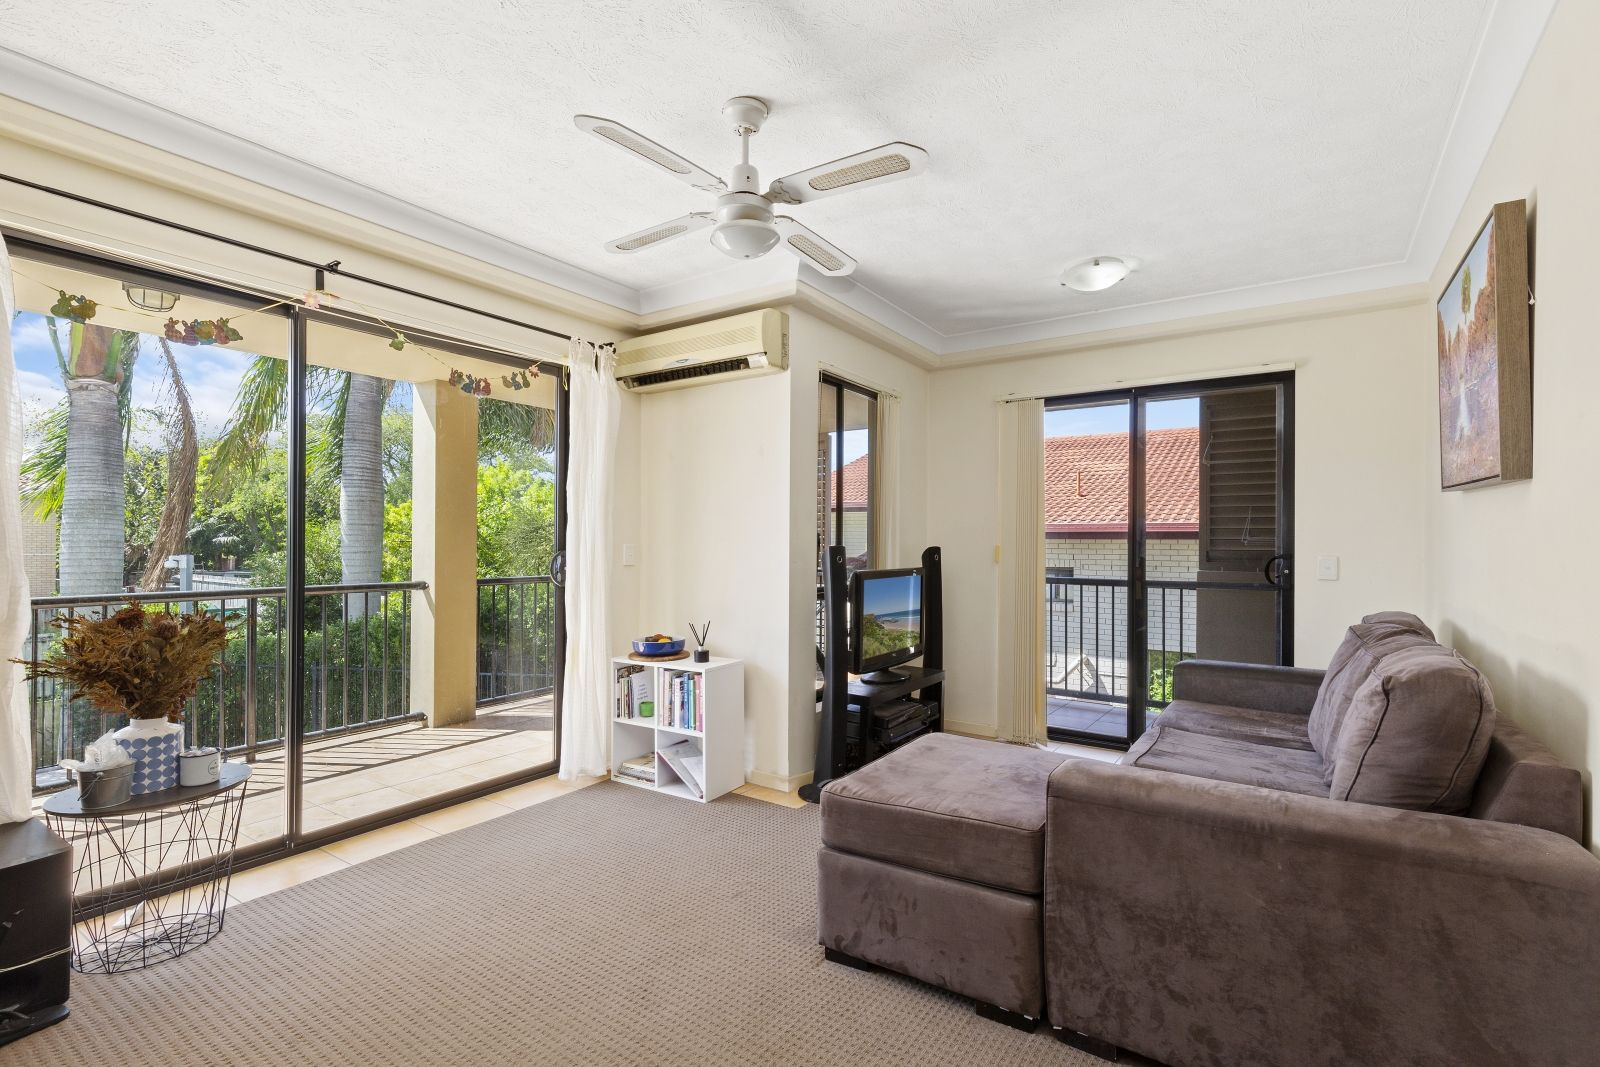 14/3 Tate  Street, Southport QLD 4215, Image 2